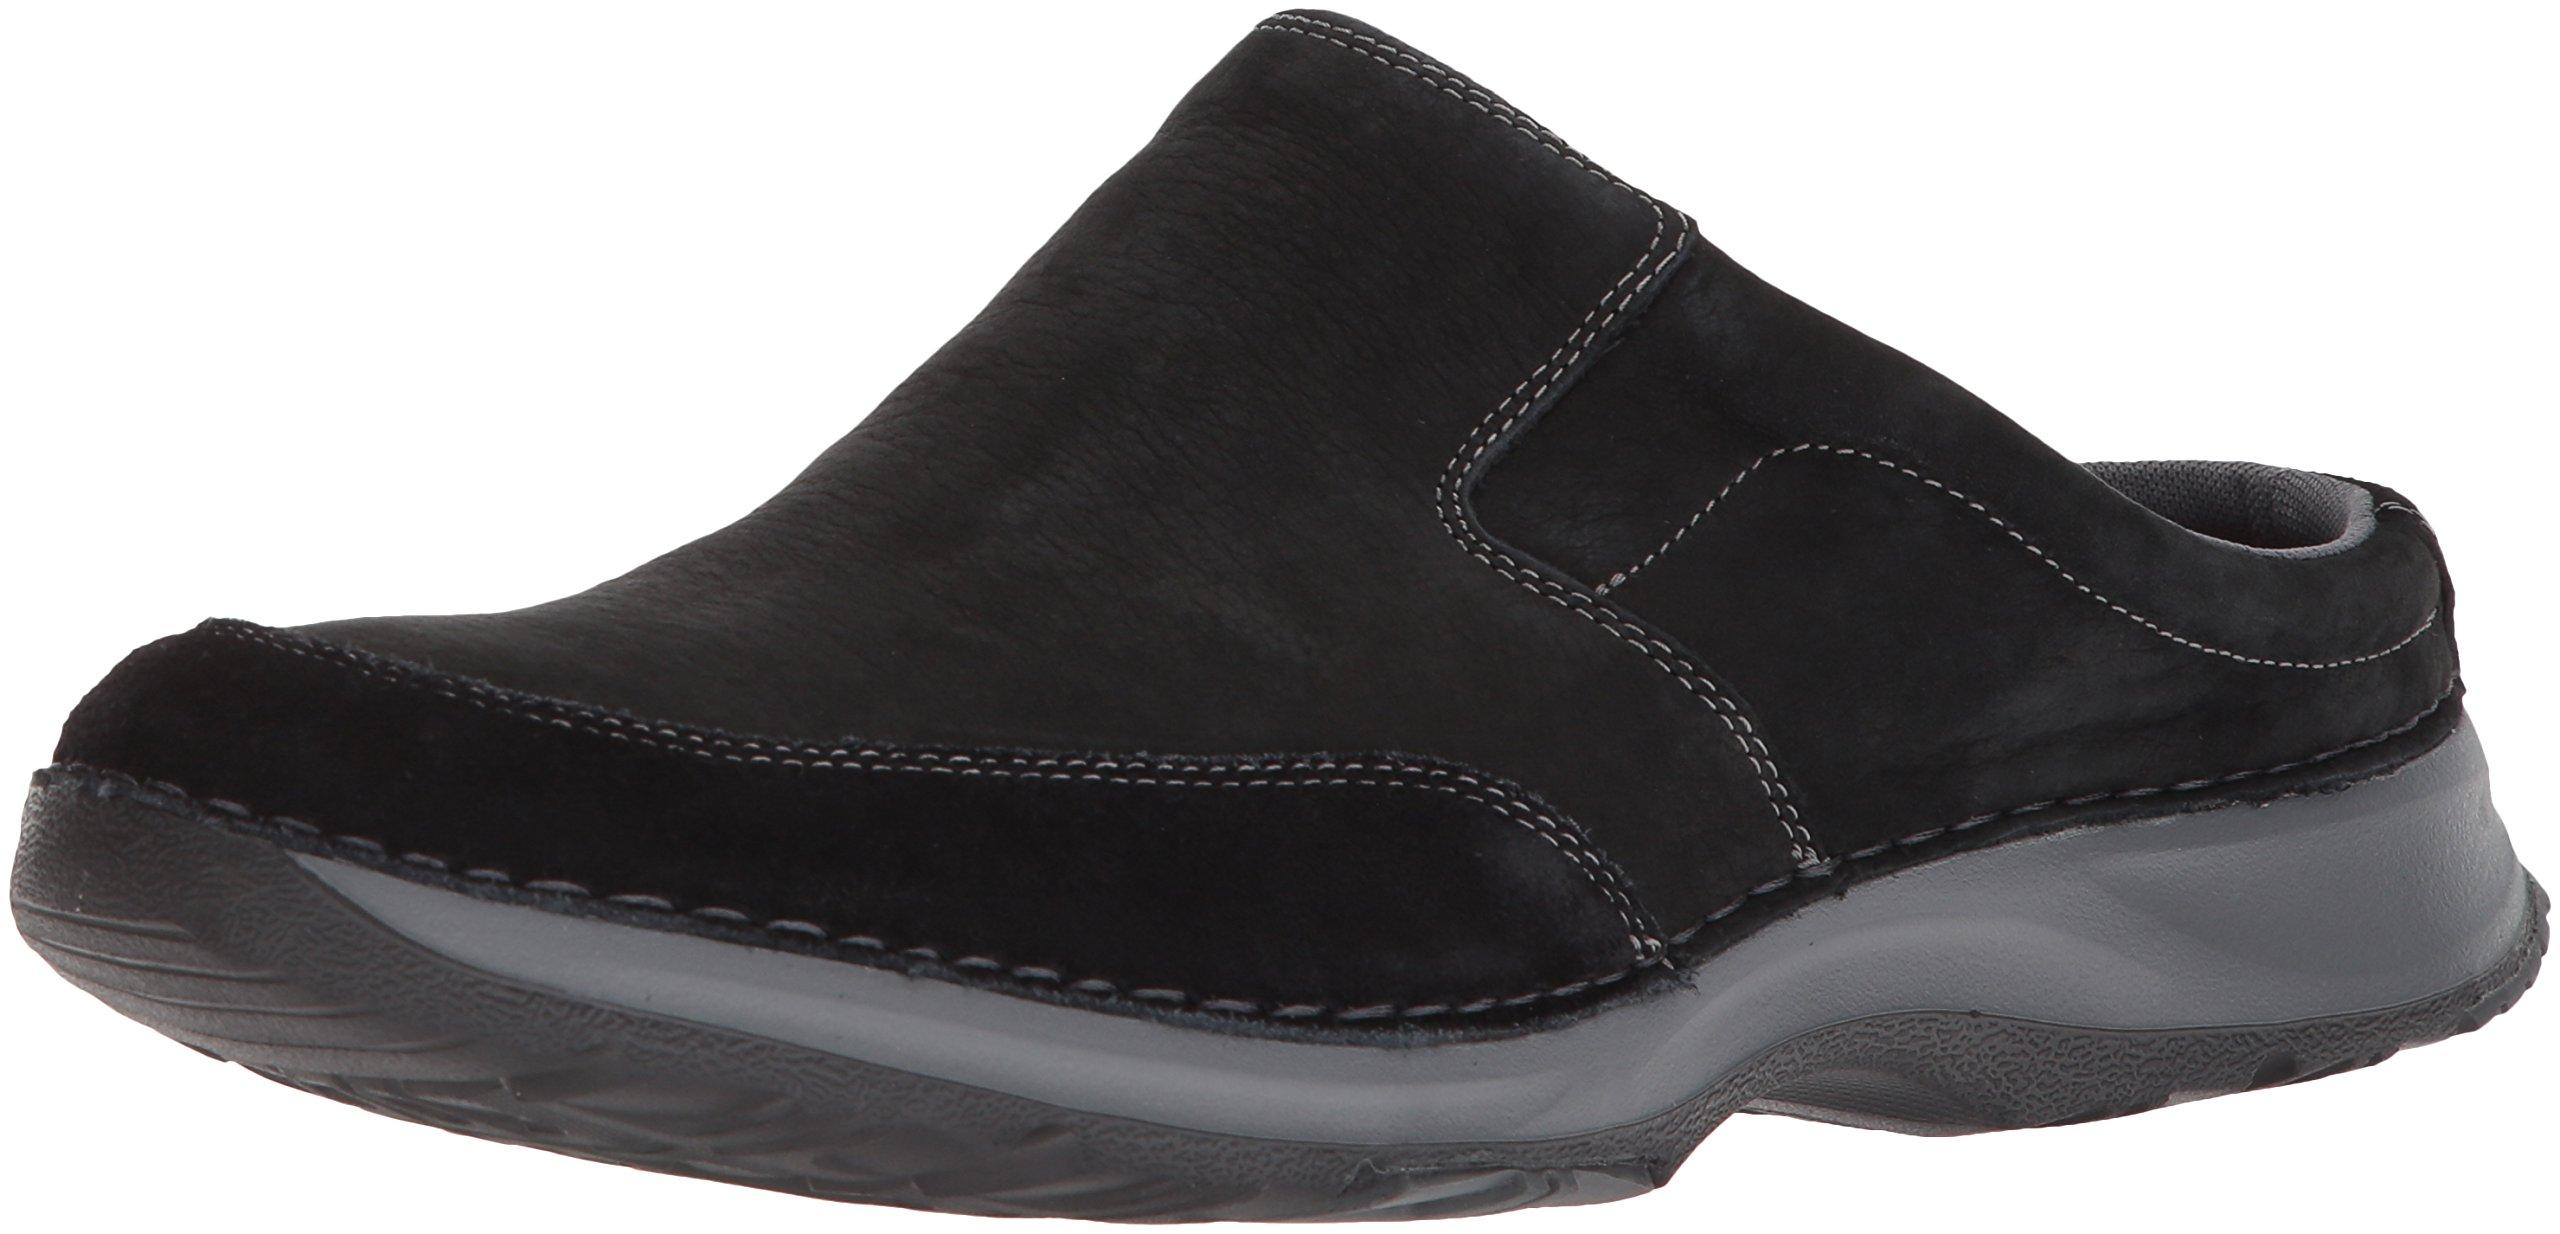 Rockport Men's RocSports Lite Five Clog Shoe, black leather, 12 W US